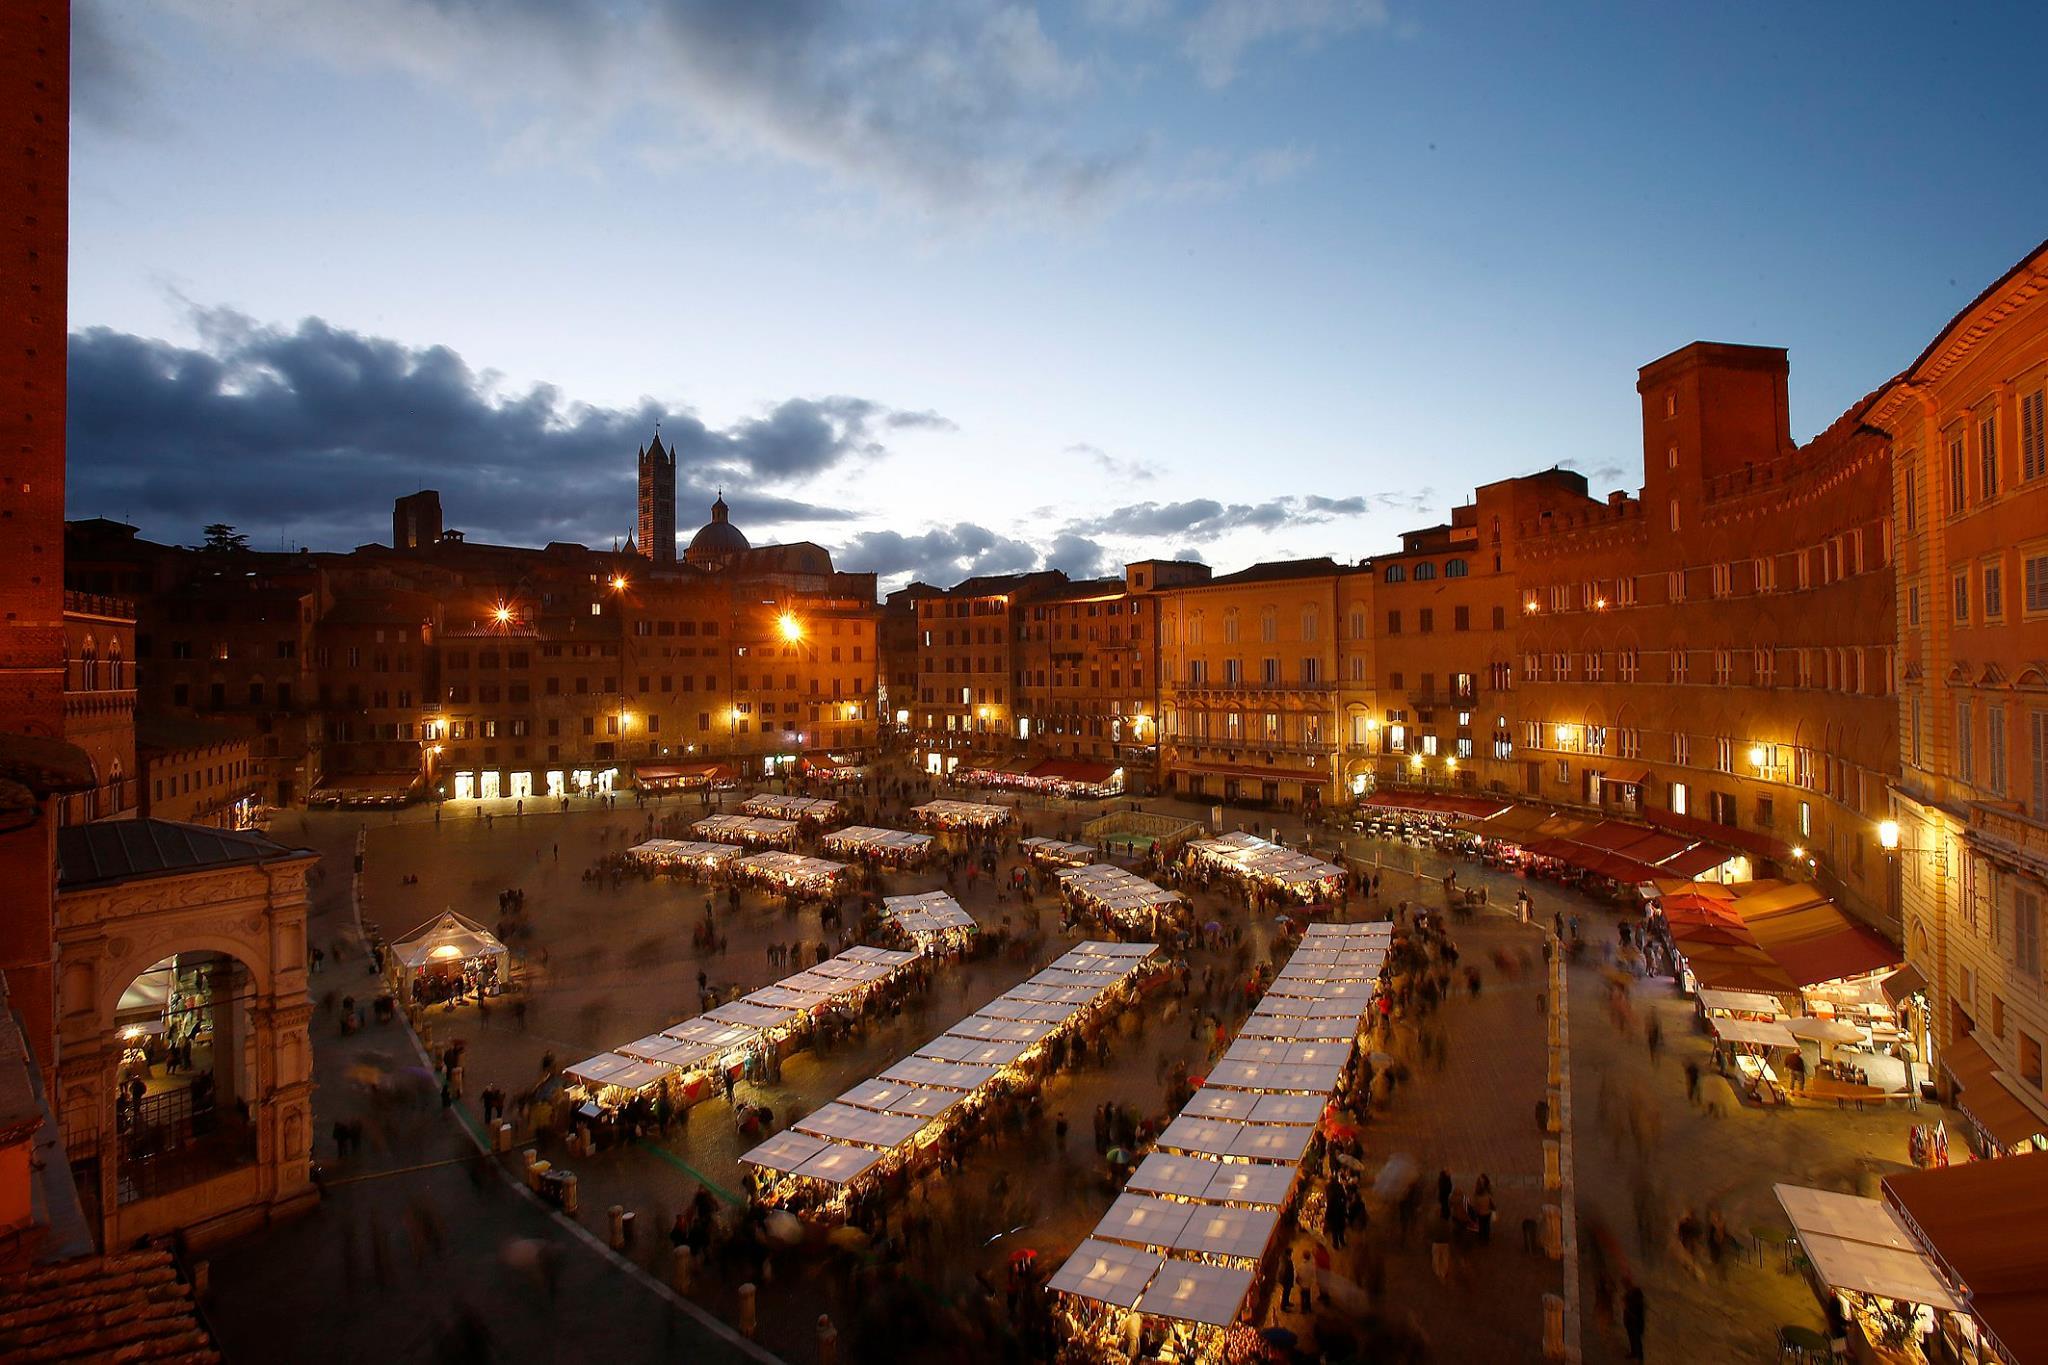 Christmas-in-Tuscany-Market-Siena-Piazza-Del-Campo